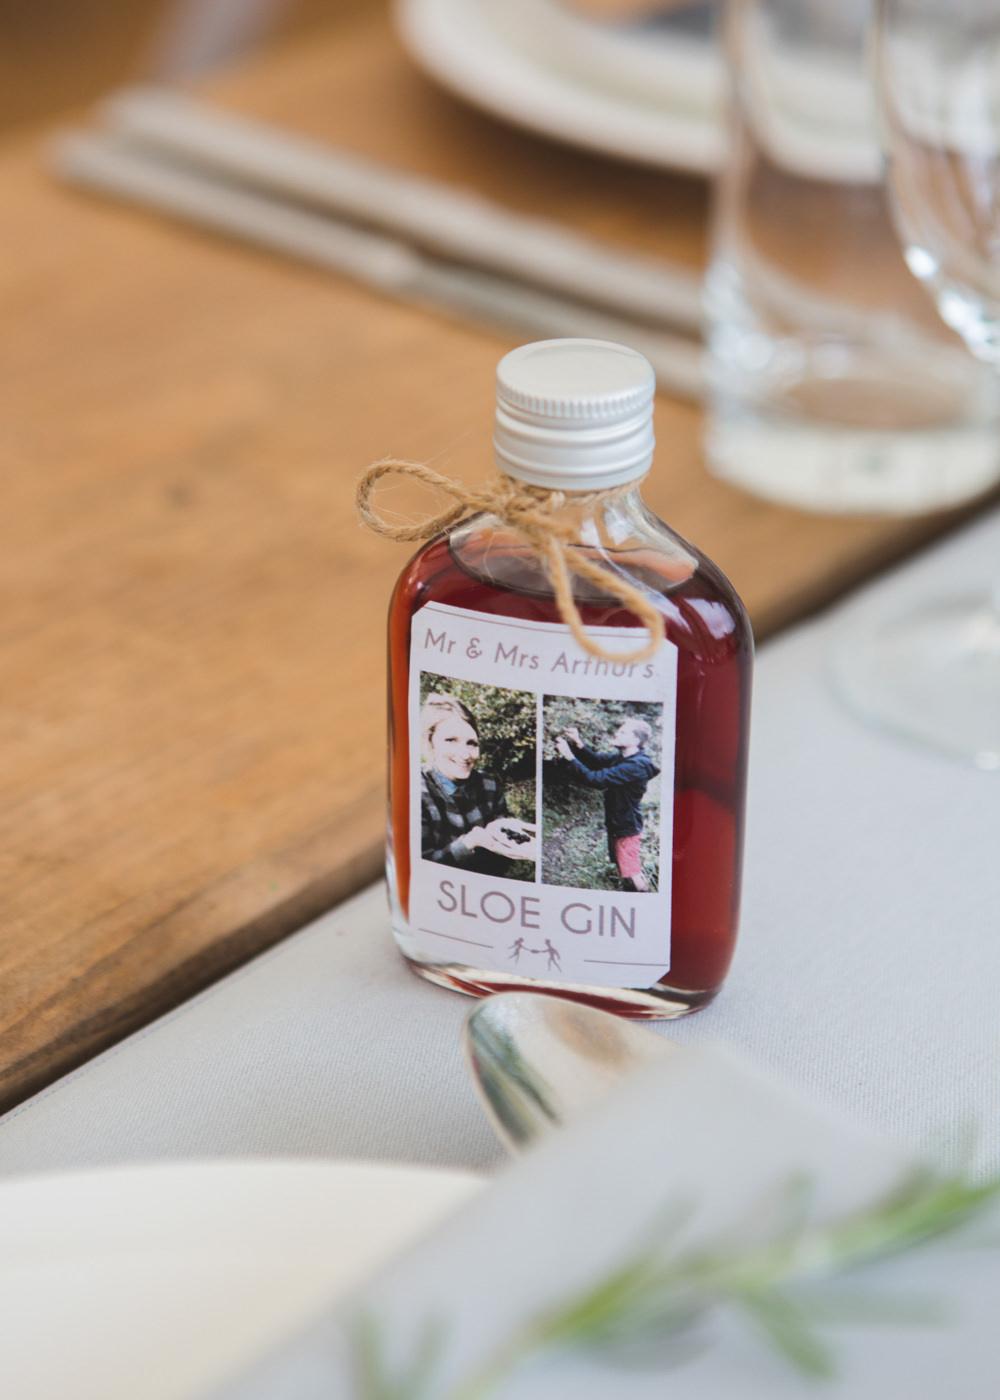 Sloe Gin Favours Airbnb Wedding Pickavance Weddings